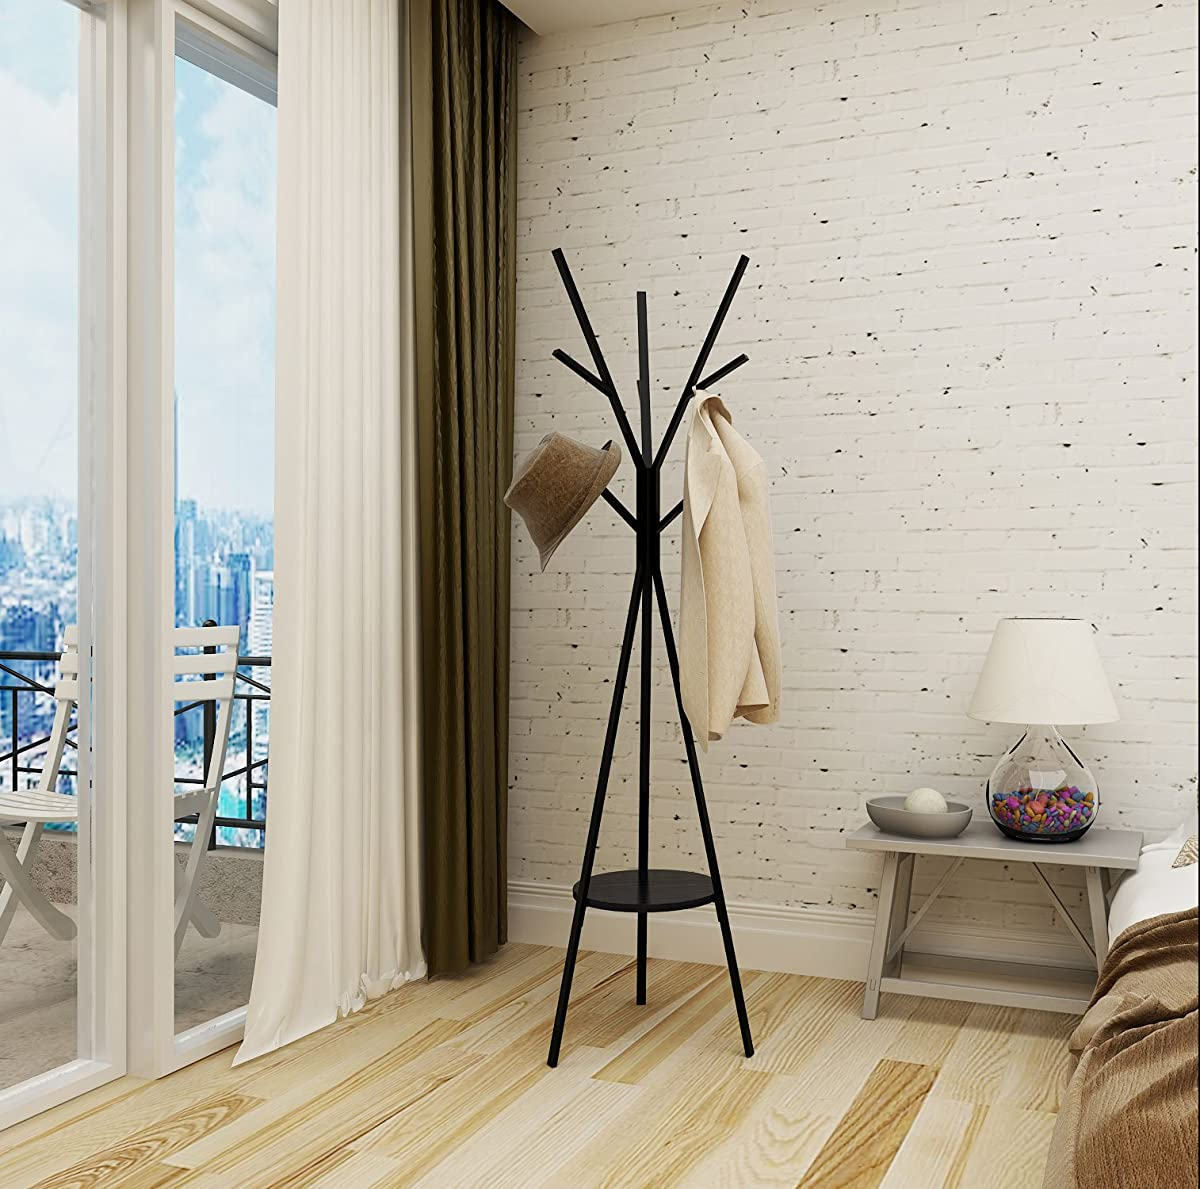 "Home-Like Metal Coat Rack Hat Hanger Holder Hall Tree Hallstand Garment Rack Clothing Rack Tree Stand Suit for Bedroom Office Hallway Entryway (70.87"" H -Black)"